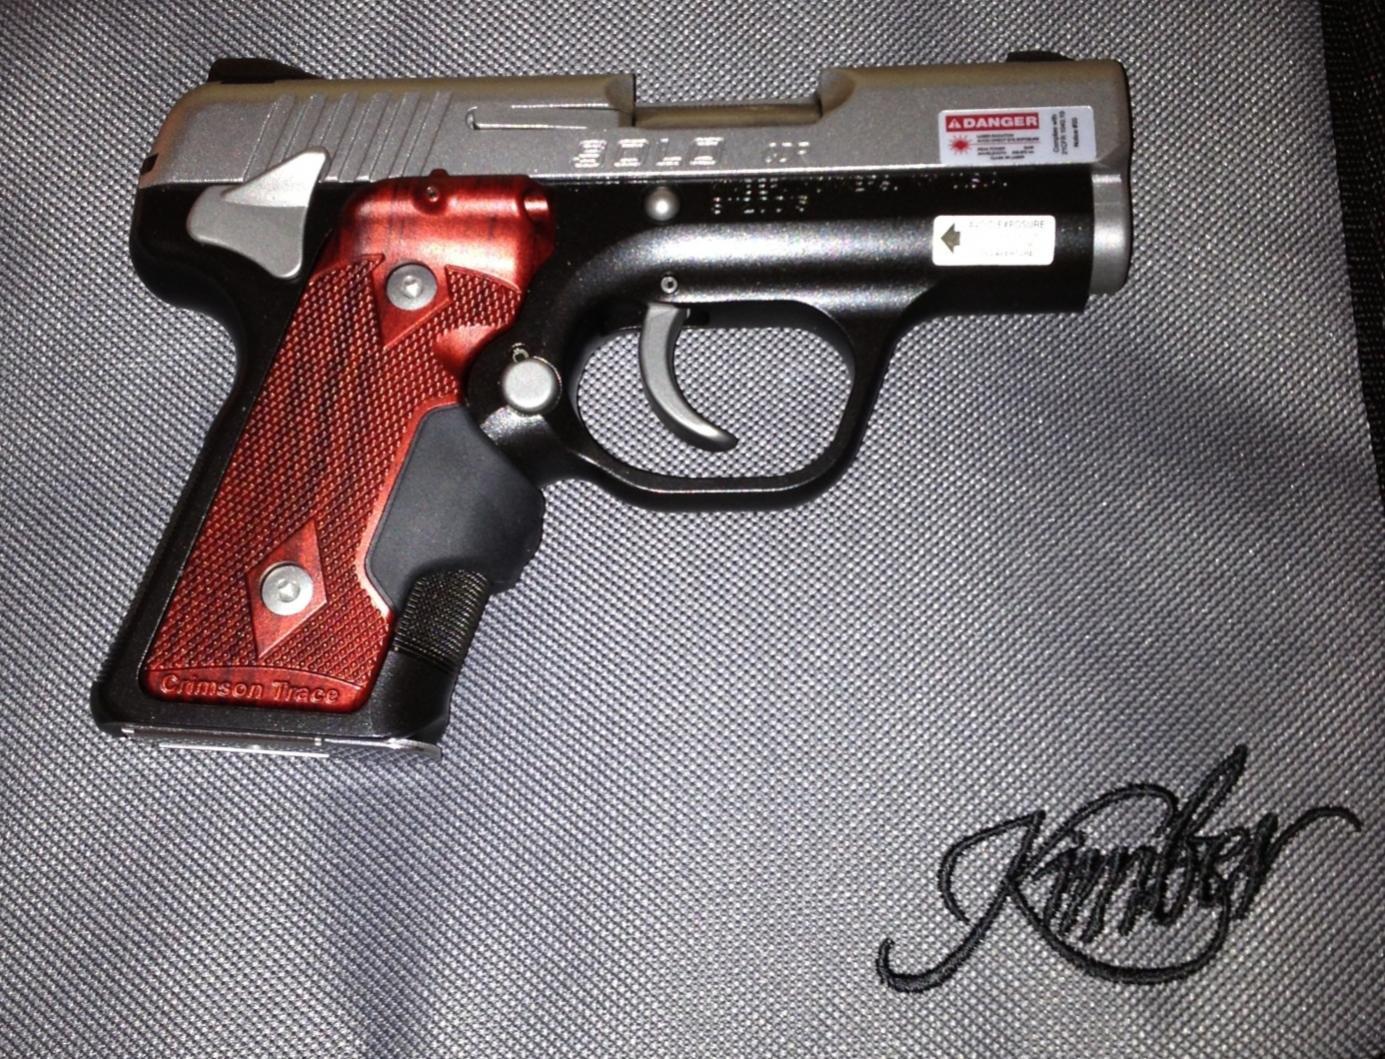 My new Kimber SOLO CDP-image.jpg